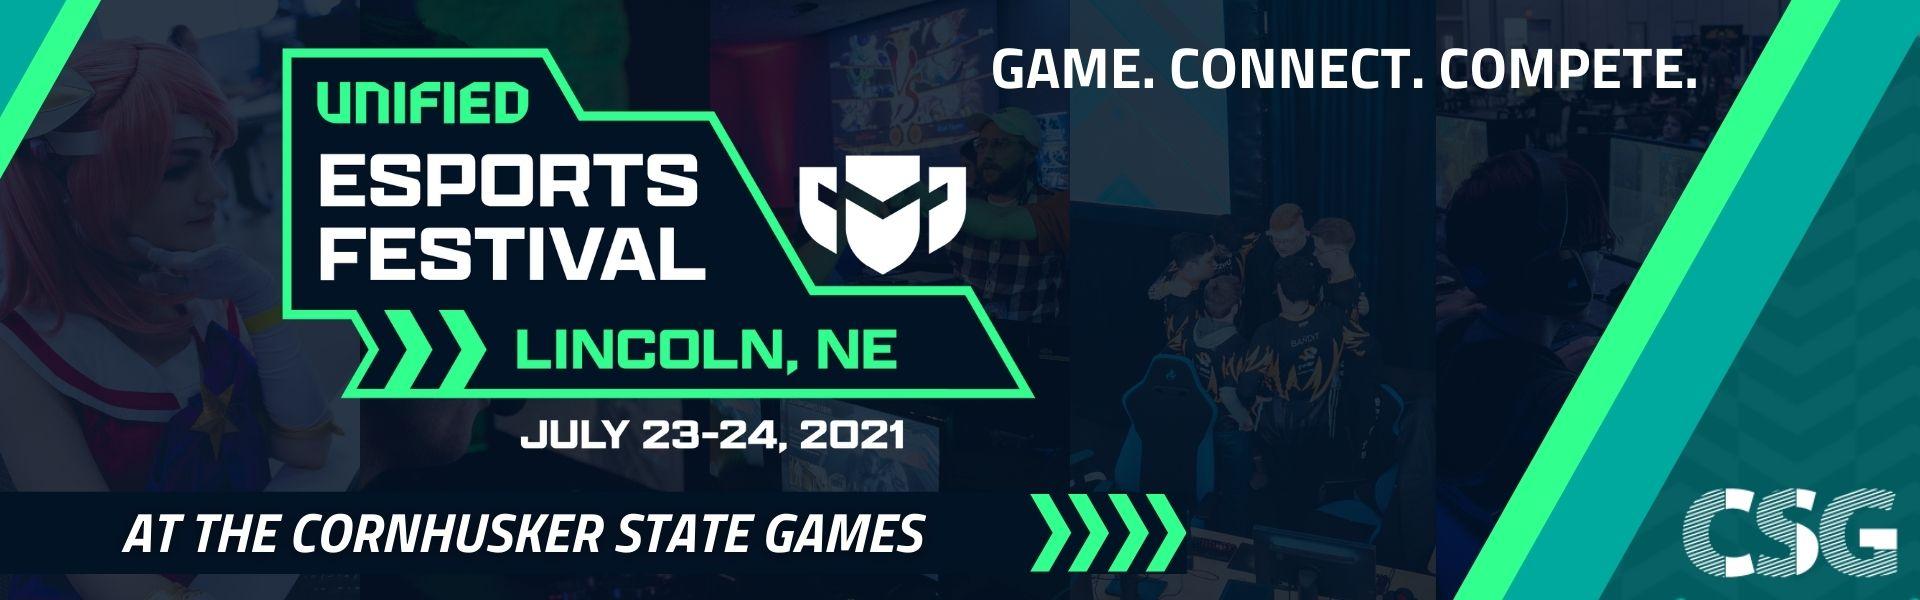 General Admission for Esports Festival: Lincoln, NE